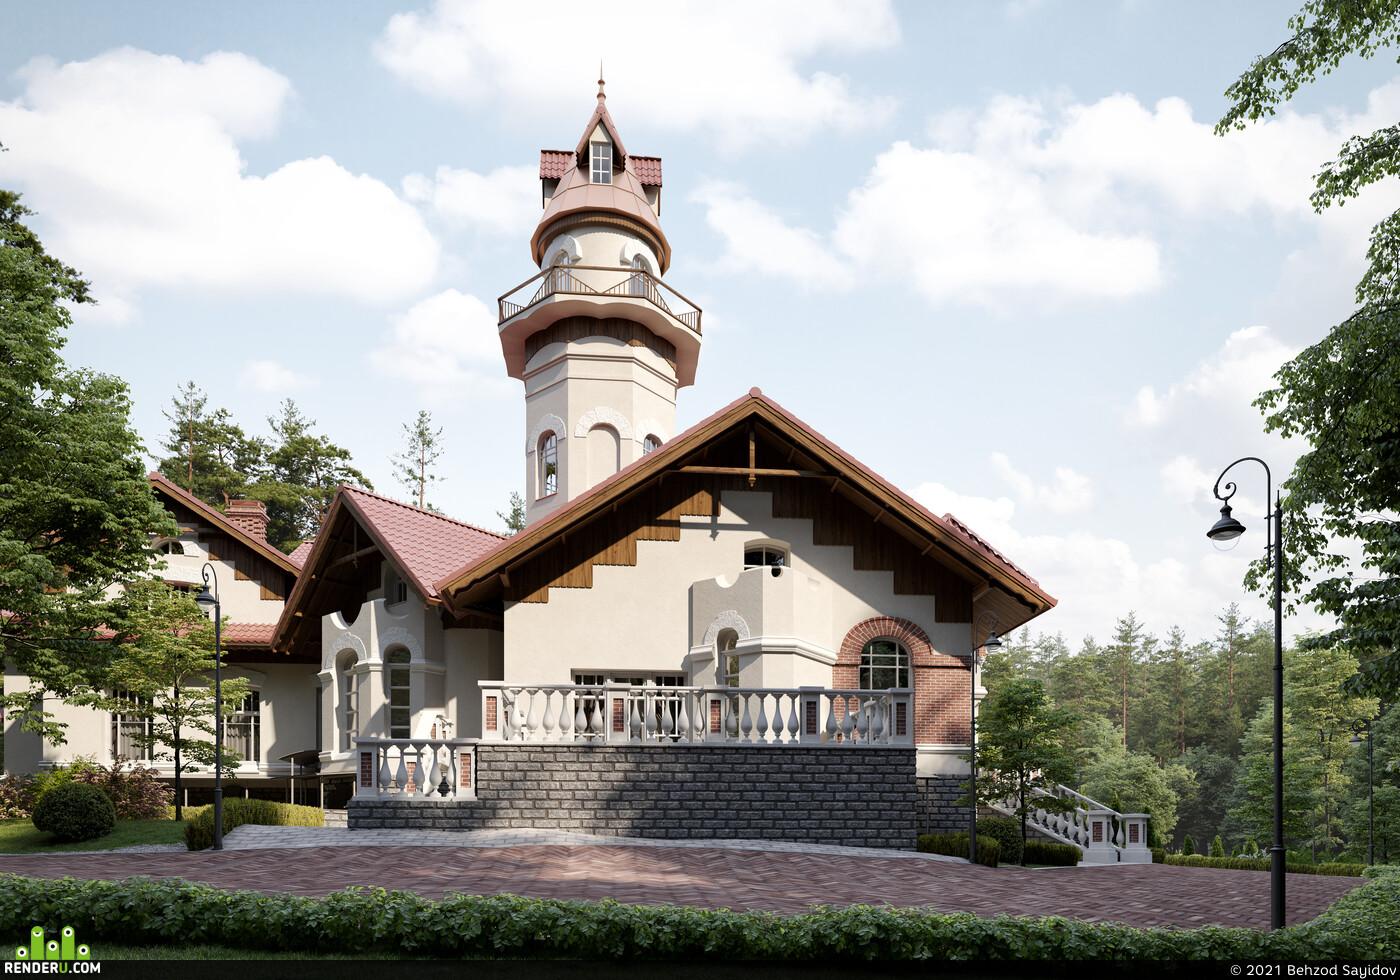 3ds max, corona render, Adobe Photoshop, 3d visualization, 3D Architecture, Exterior